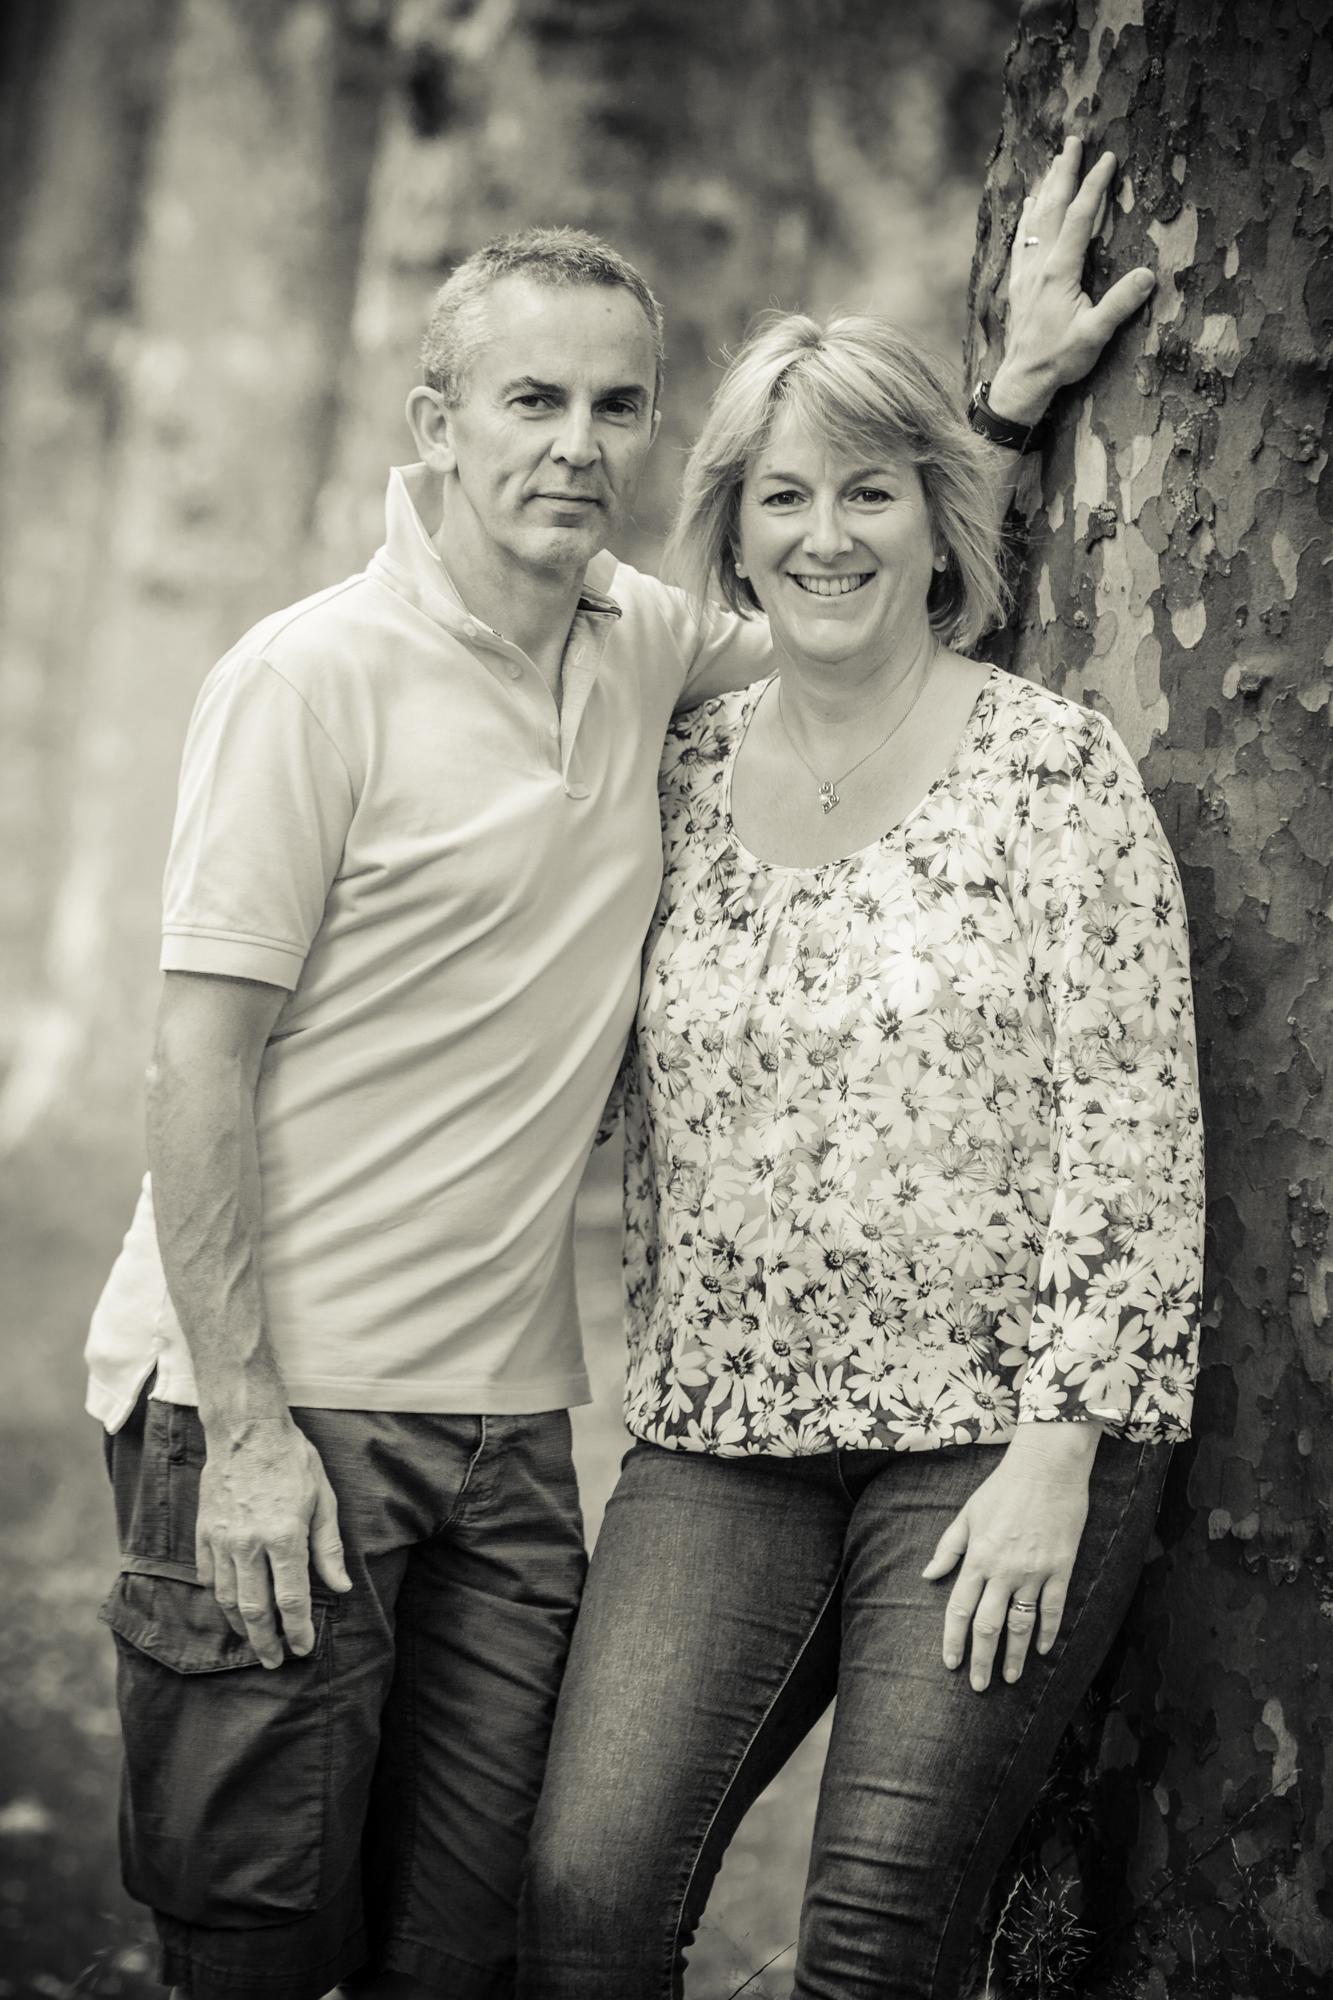 Doting Dad - Portrait photographer